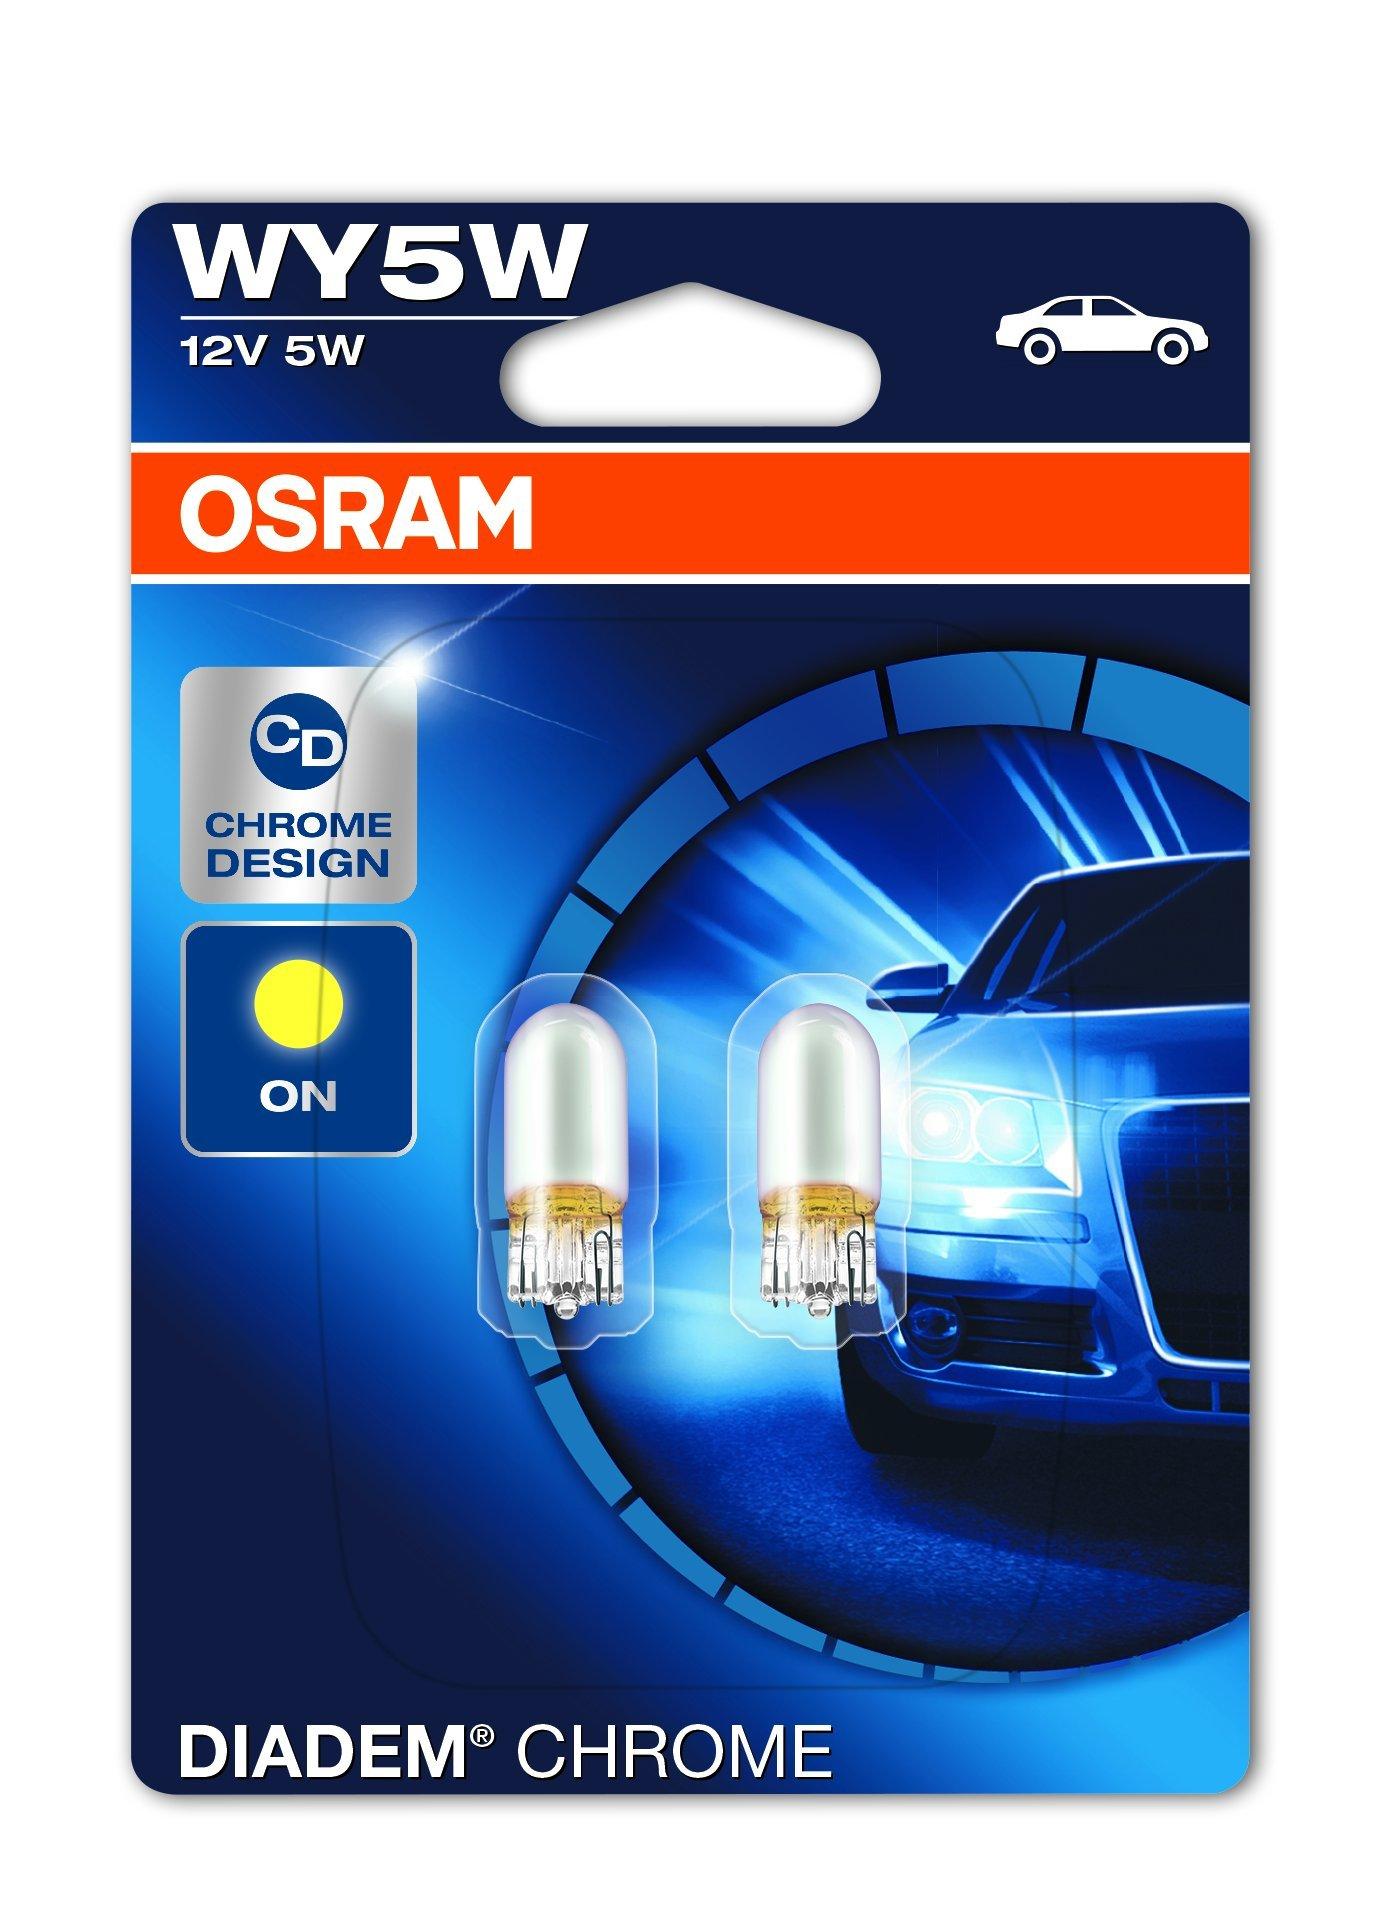 OSRAM DIADEM CHROME Luz de intermitencia WY5W 2827DC-02B doble vida en blister doble product